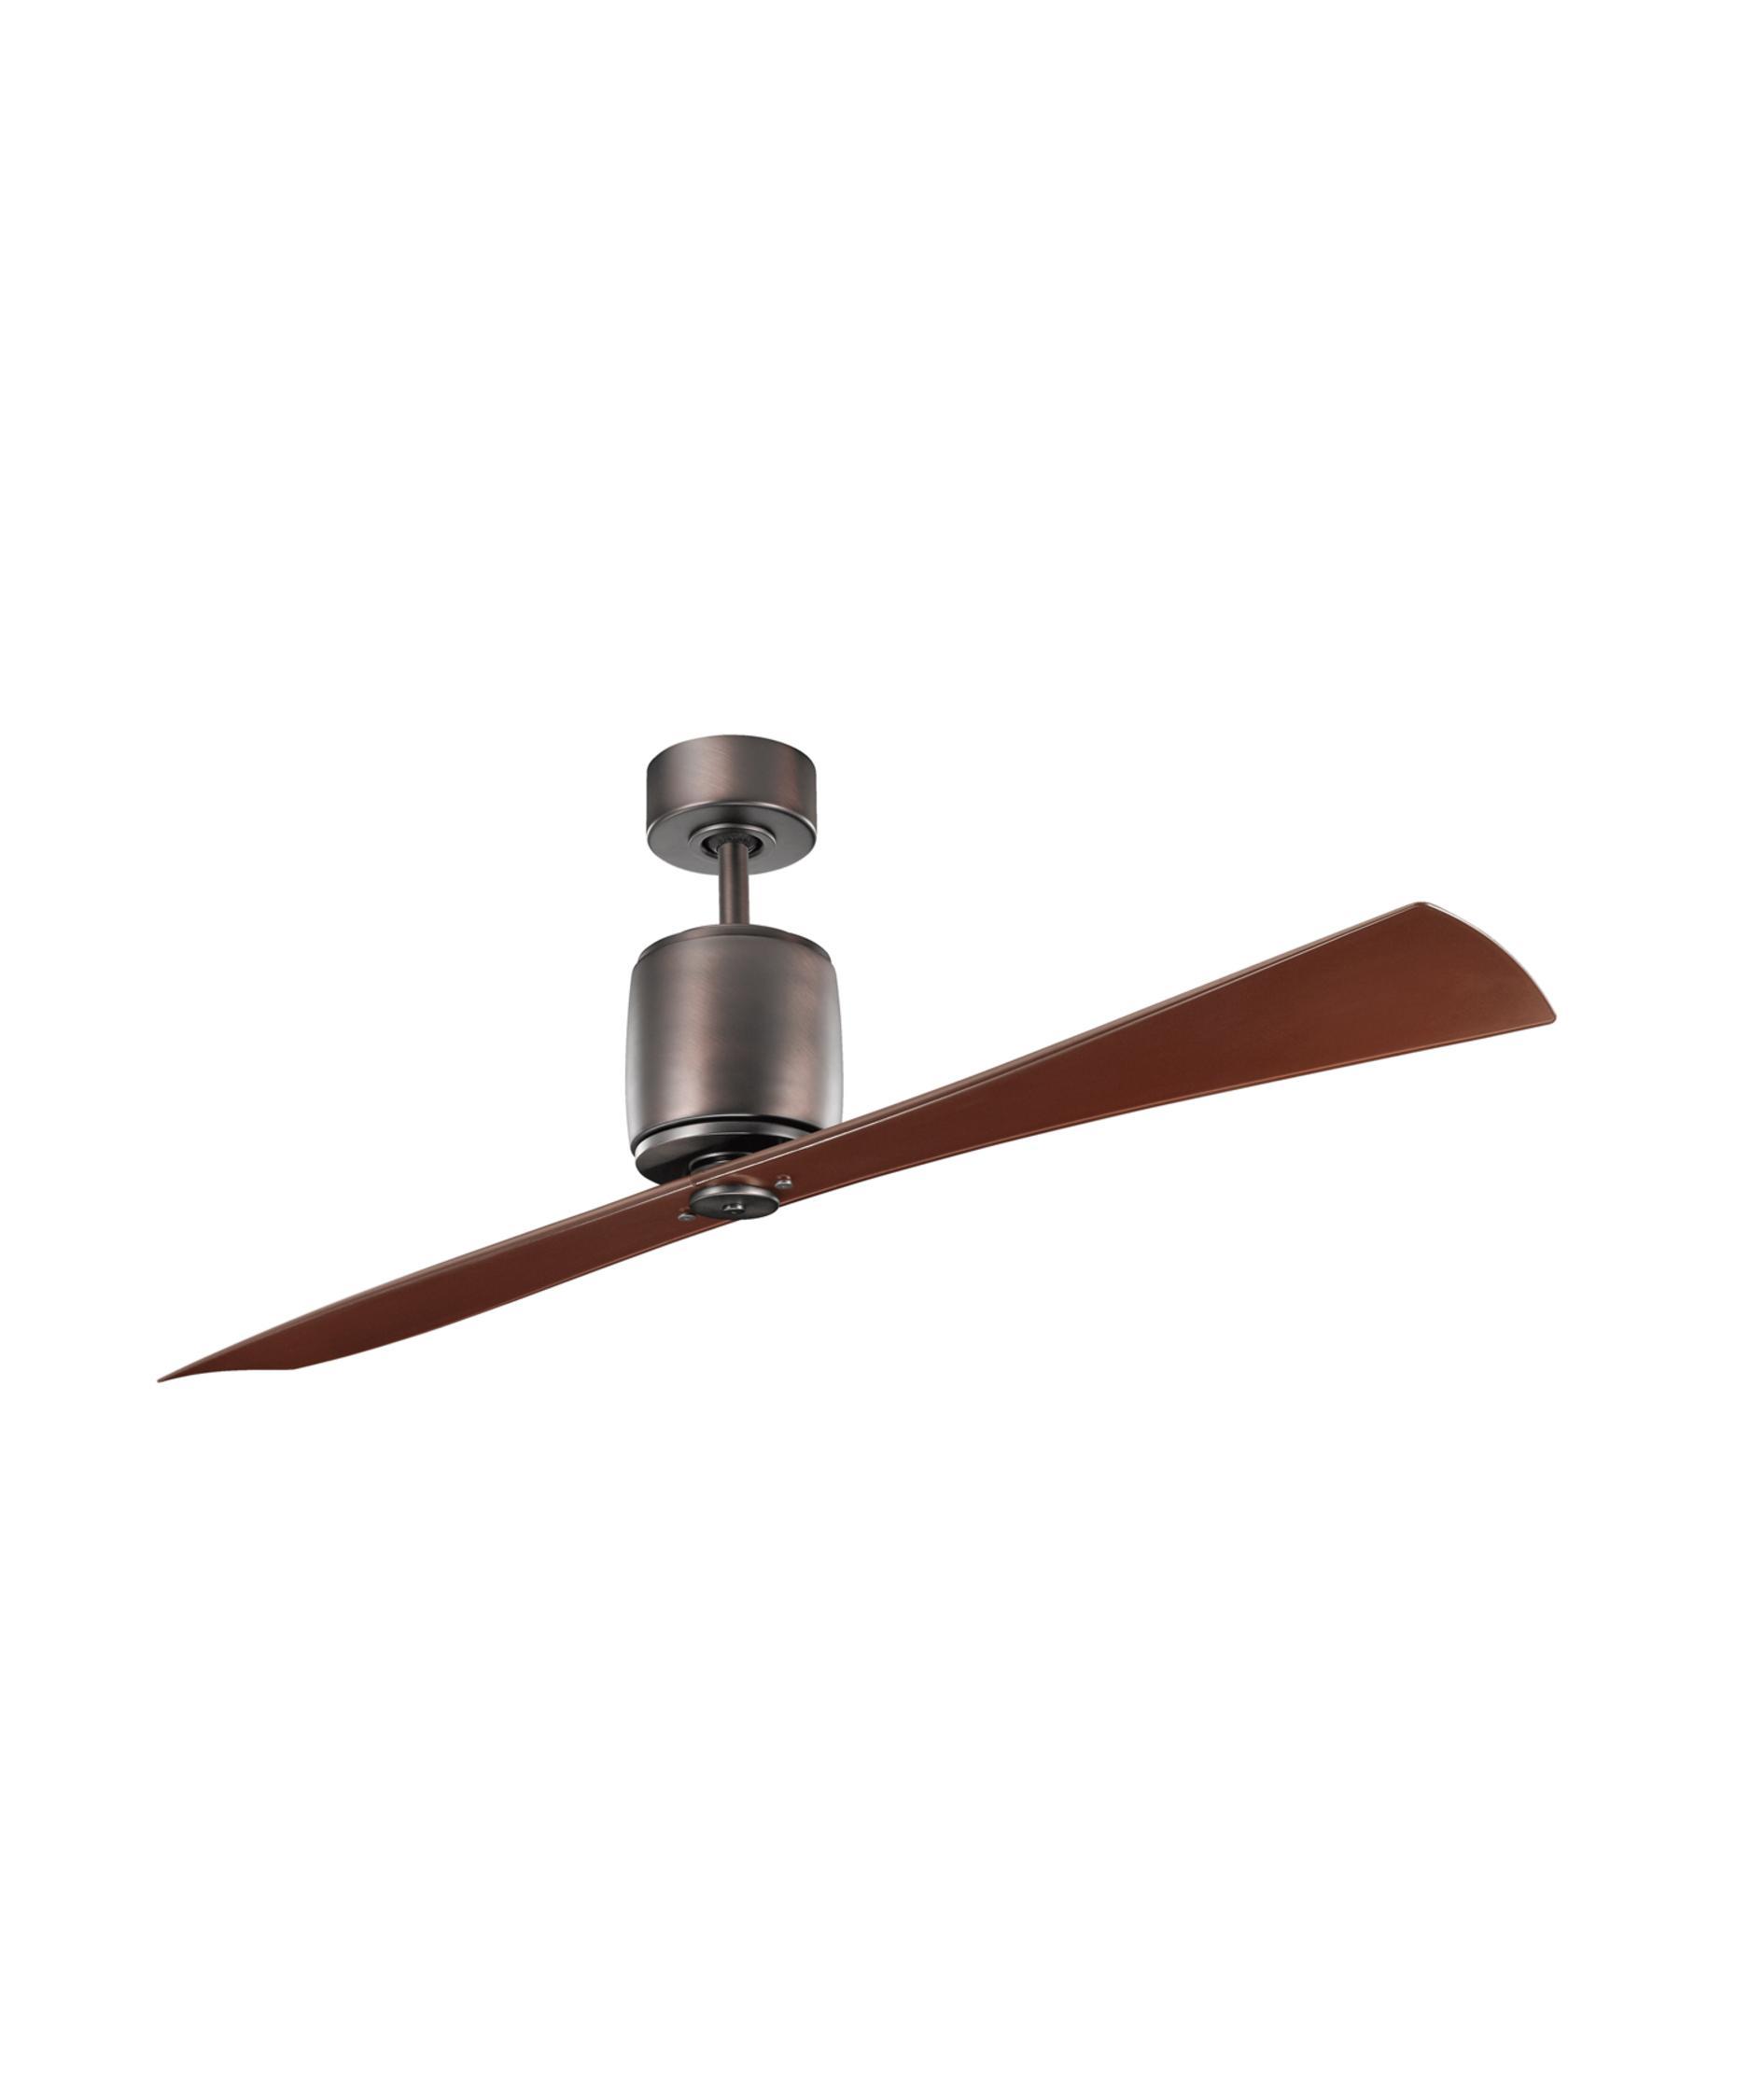 kichler  ferron  inch  blade ceiling fan  capitol  - kichler  ferron  inch  blade ceiling fan  capitol lightinglightingcom